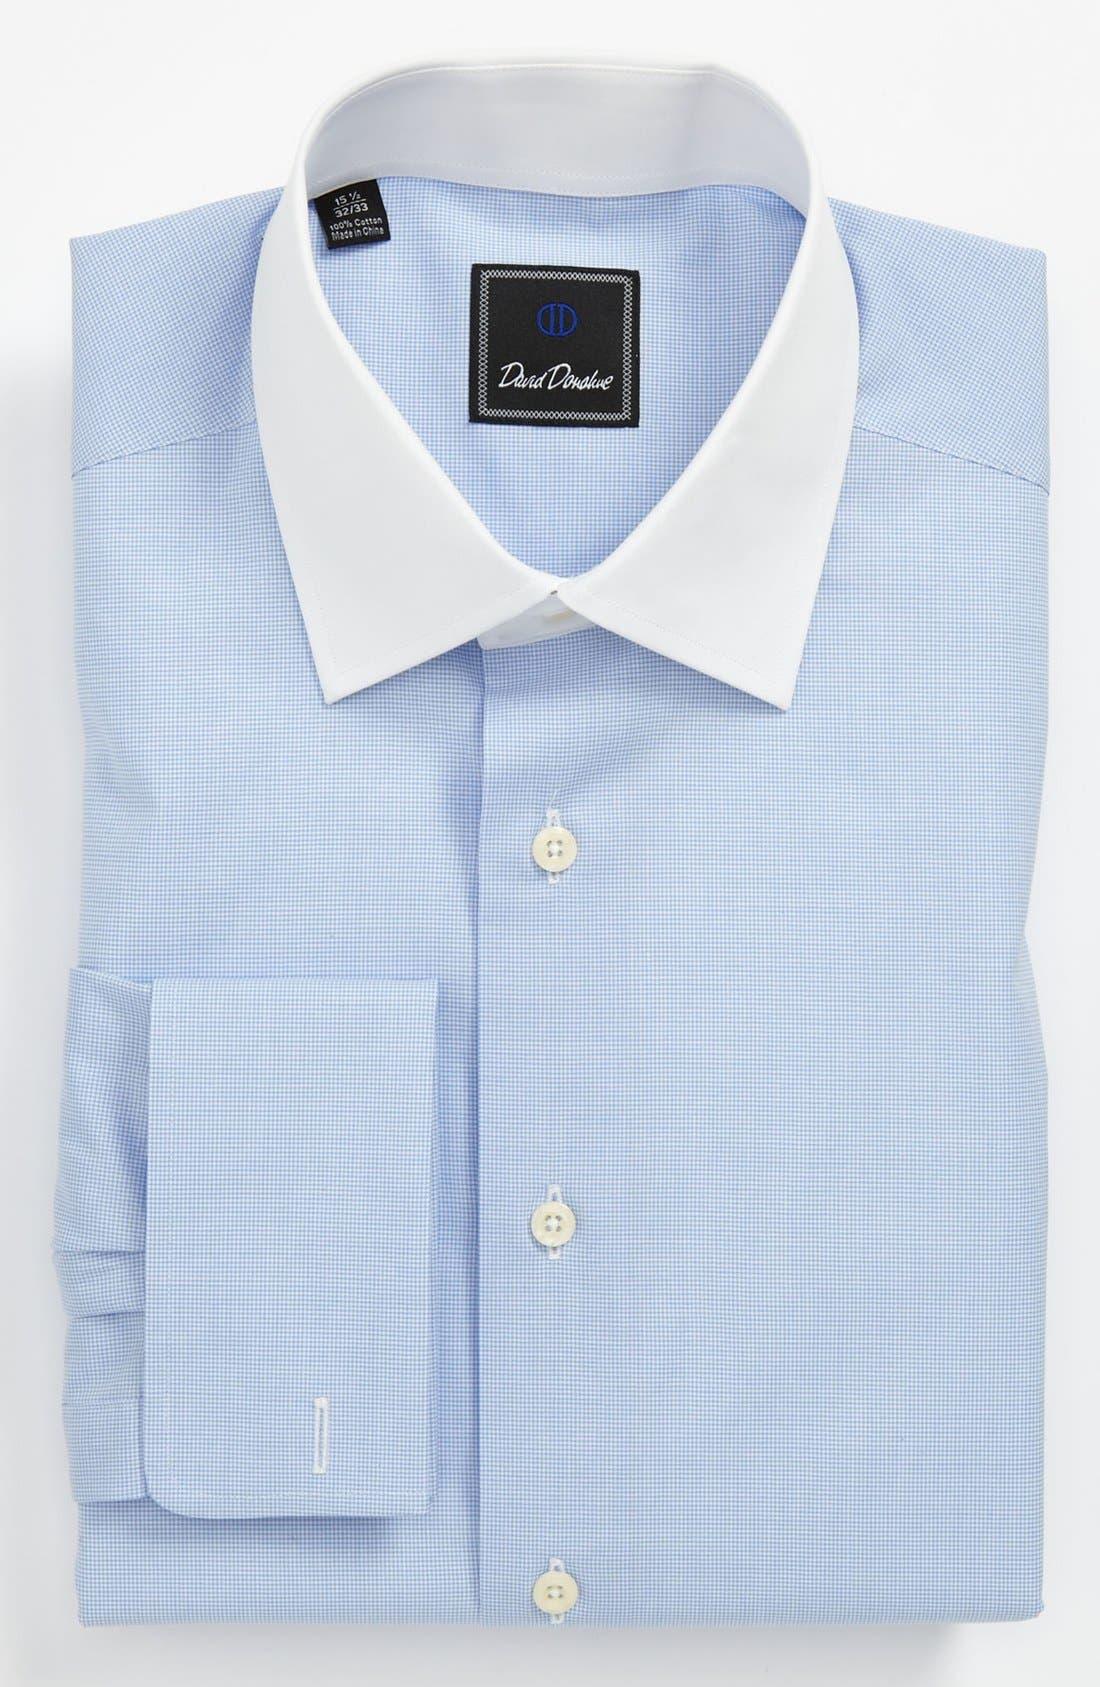 Alternate Image 1 Selected - David Donahue Traditional Fit Dress Shirt